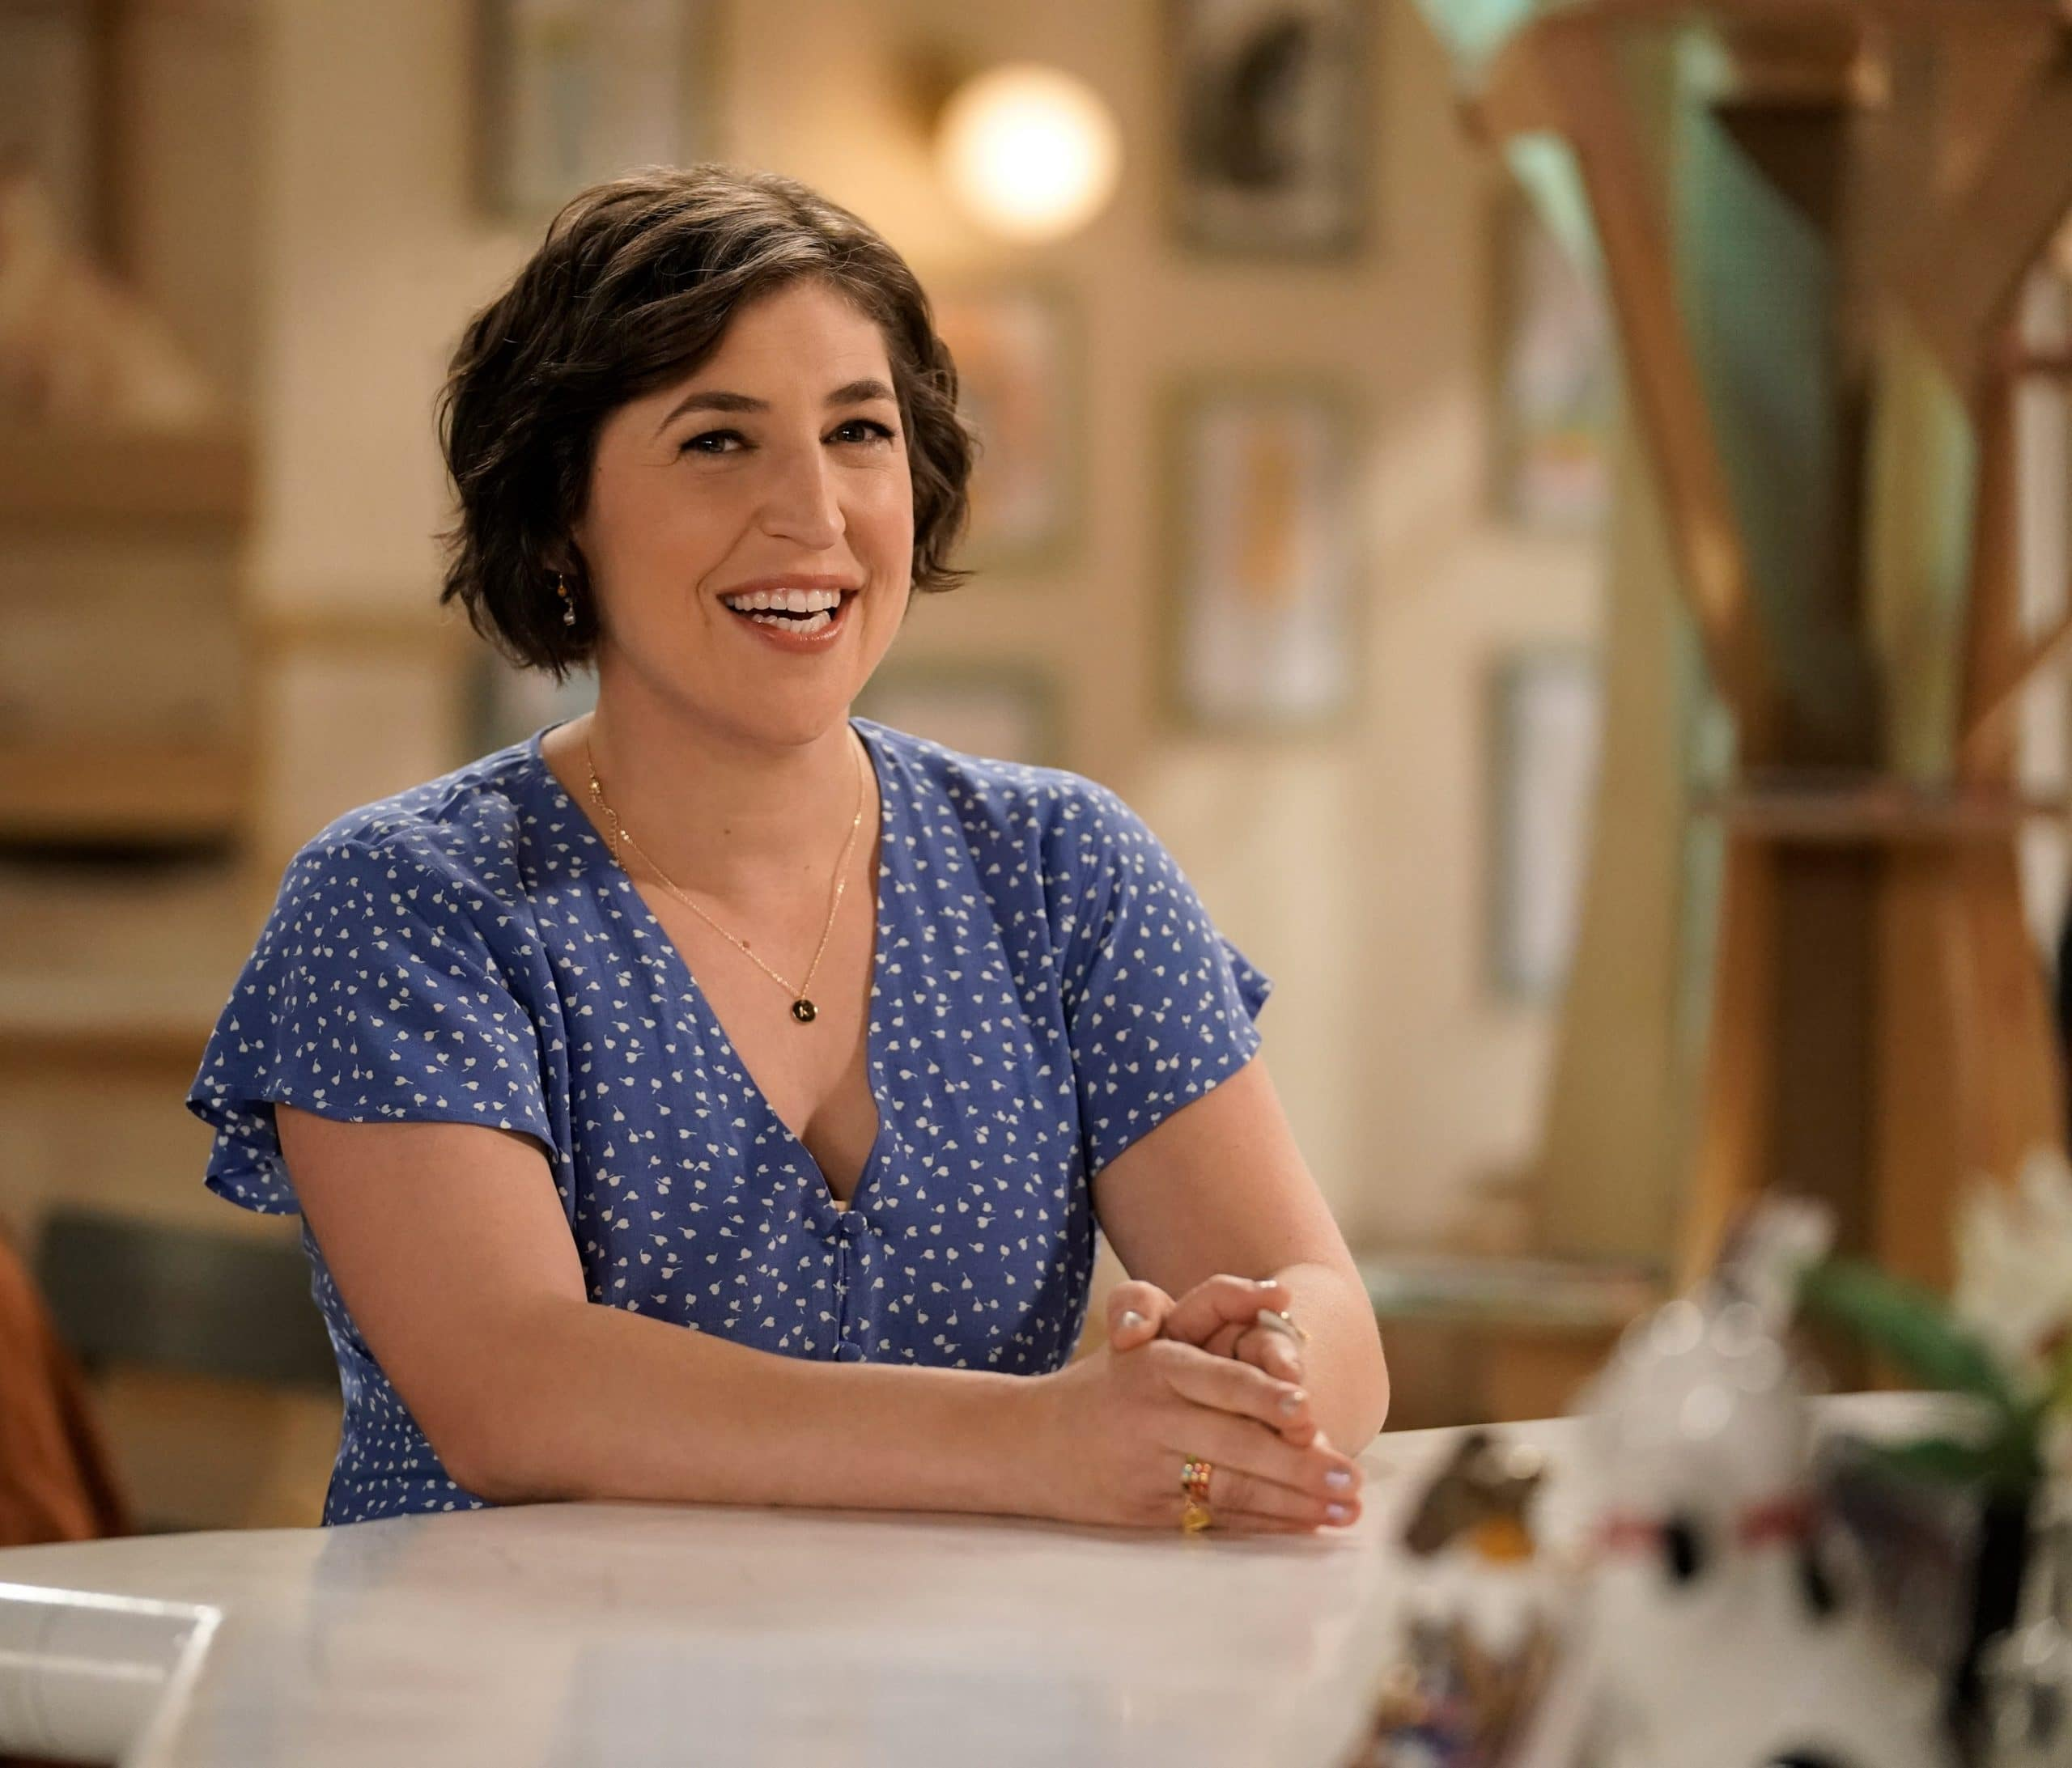 'Jeopardy!' Guest Host Mayim Bialik Recalls Alex Trebek's Legacy